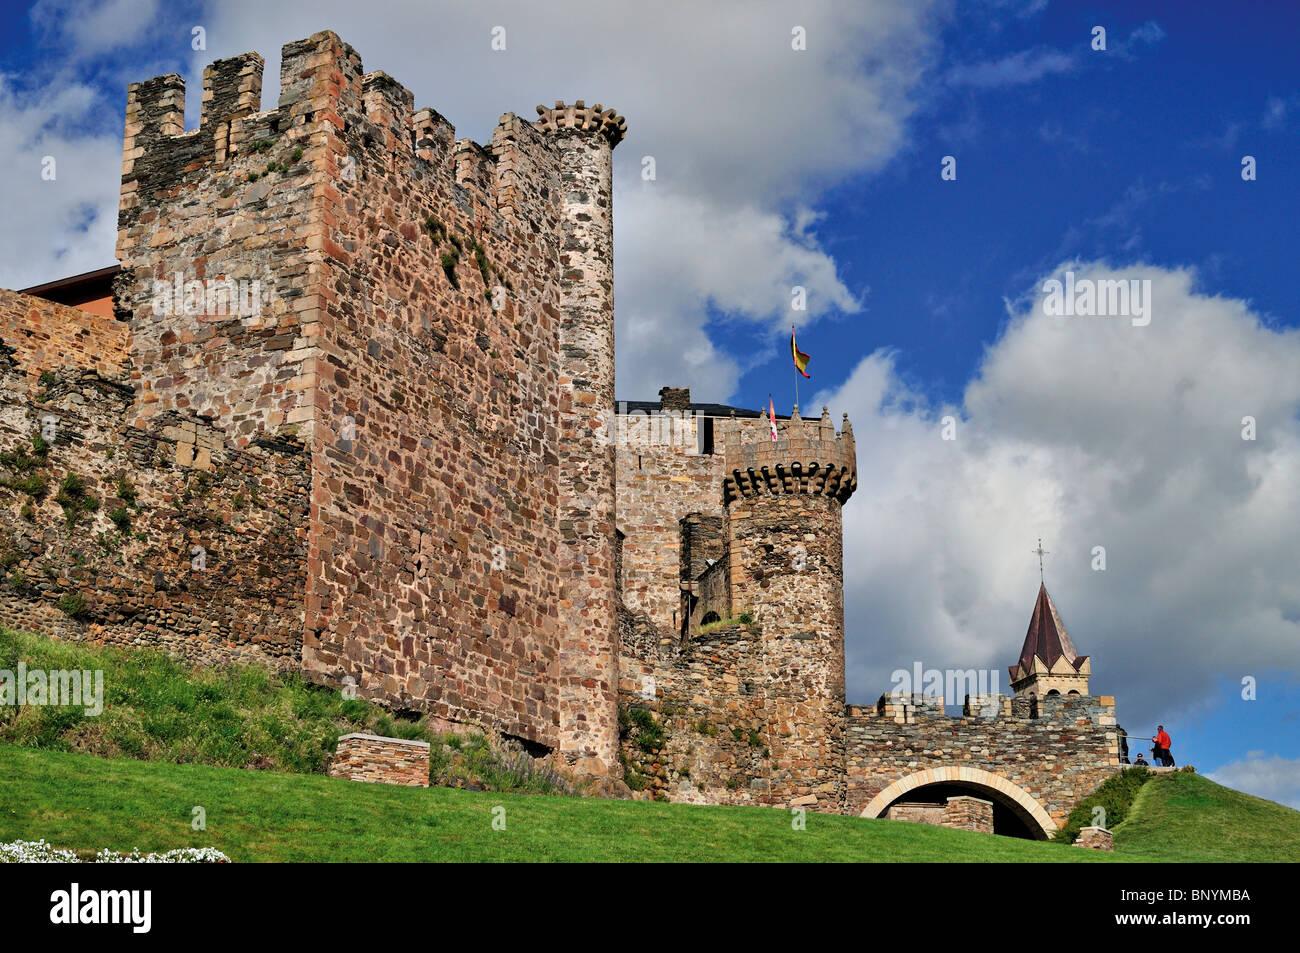 Spain, St. James Way: Templar Castle in Ponferrada - Stock Image